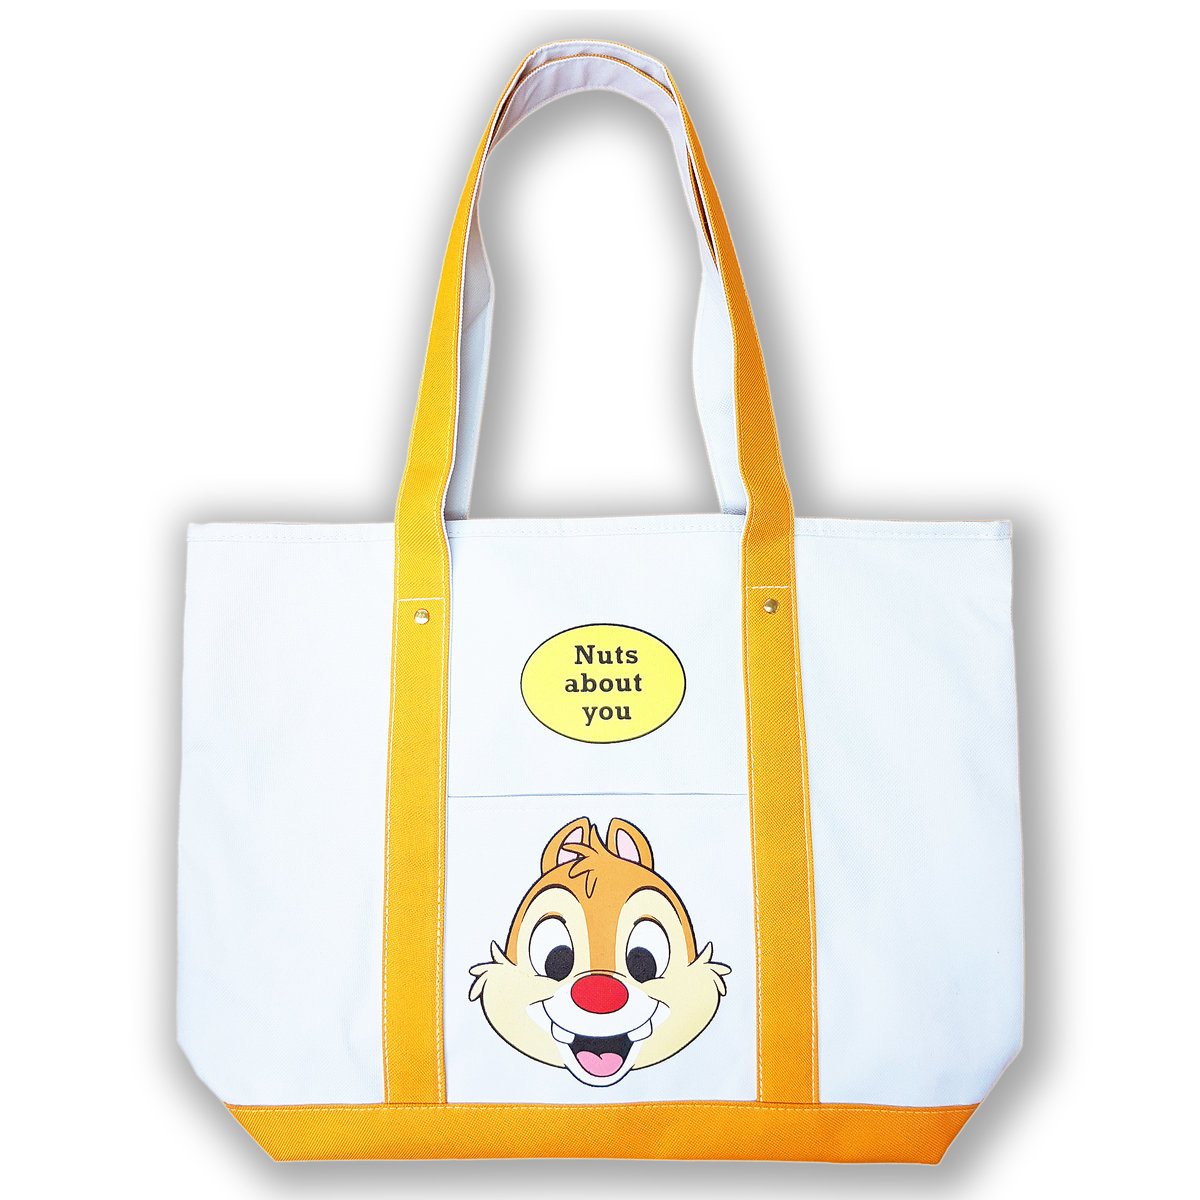 Disney - Chip n Dale (Dale) Canvas Bag (Licensed by Disney)